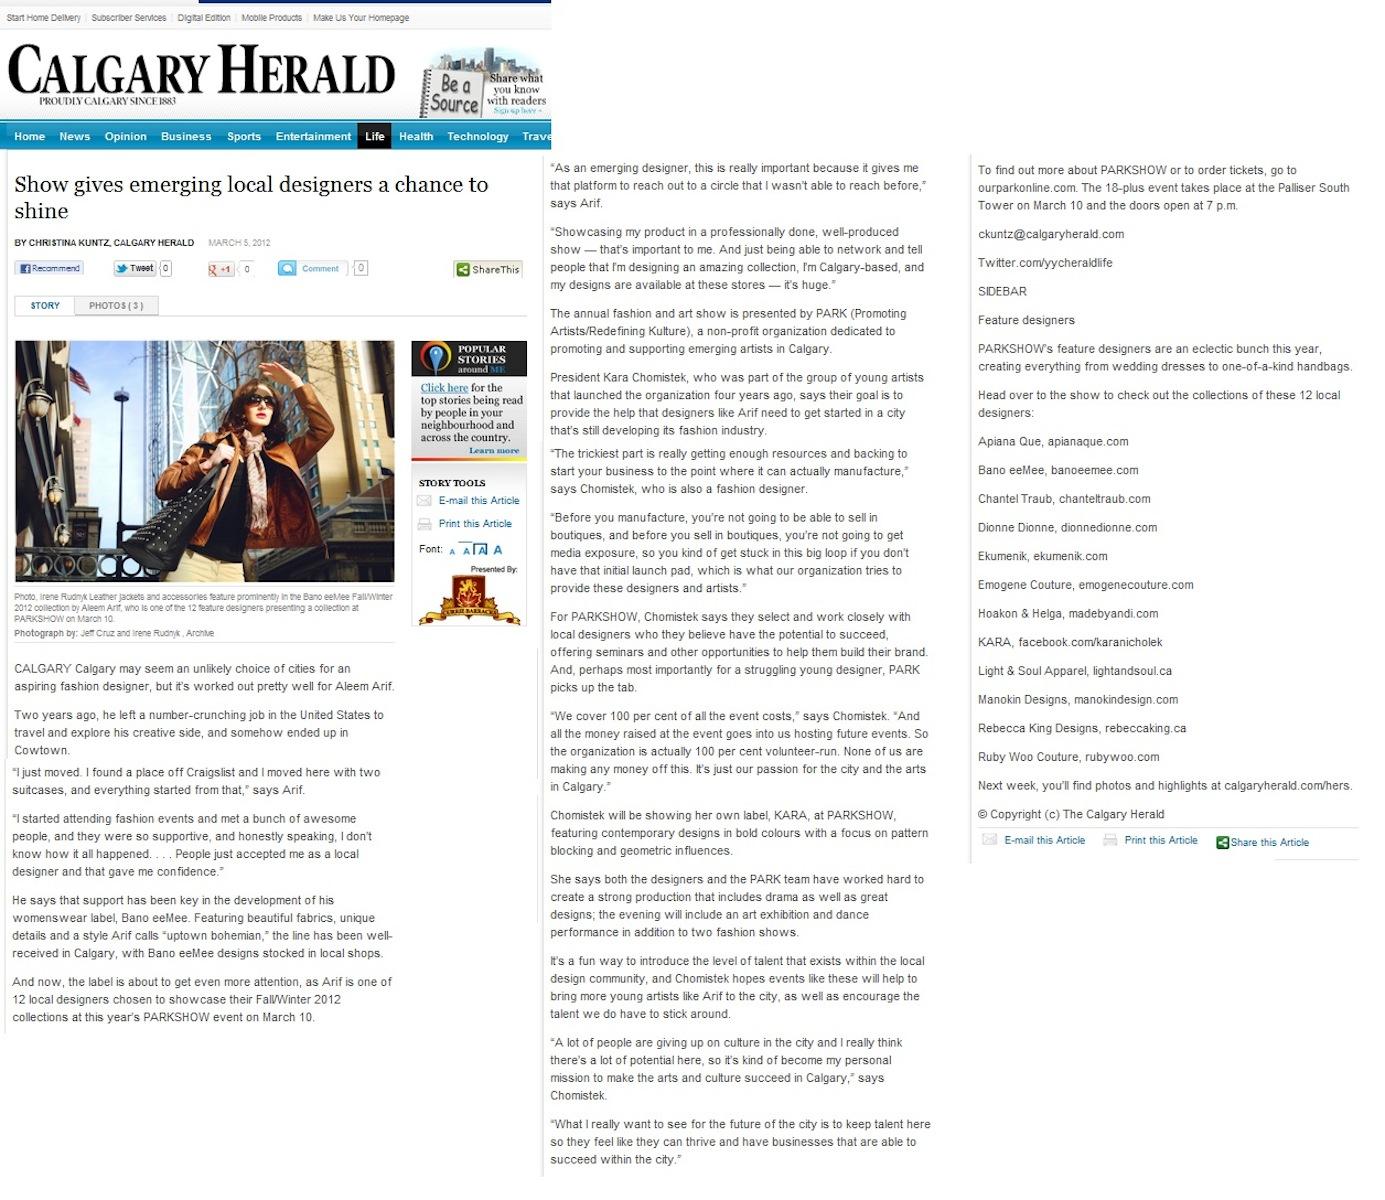 Calgary Herald Mar.5.2012 copy.jpg